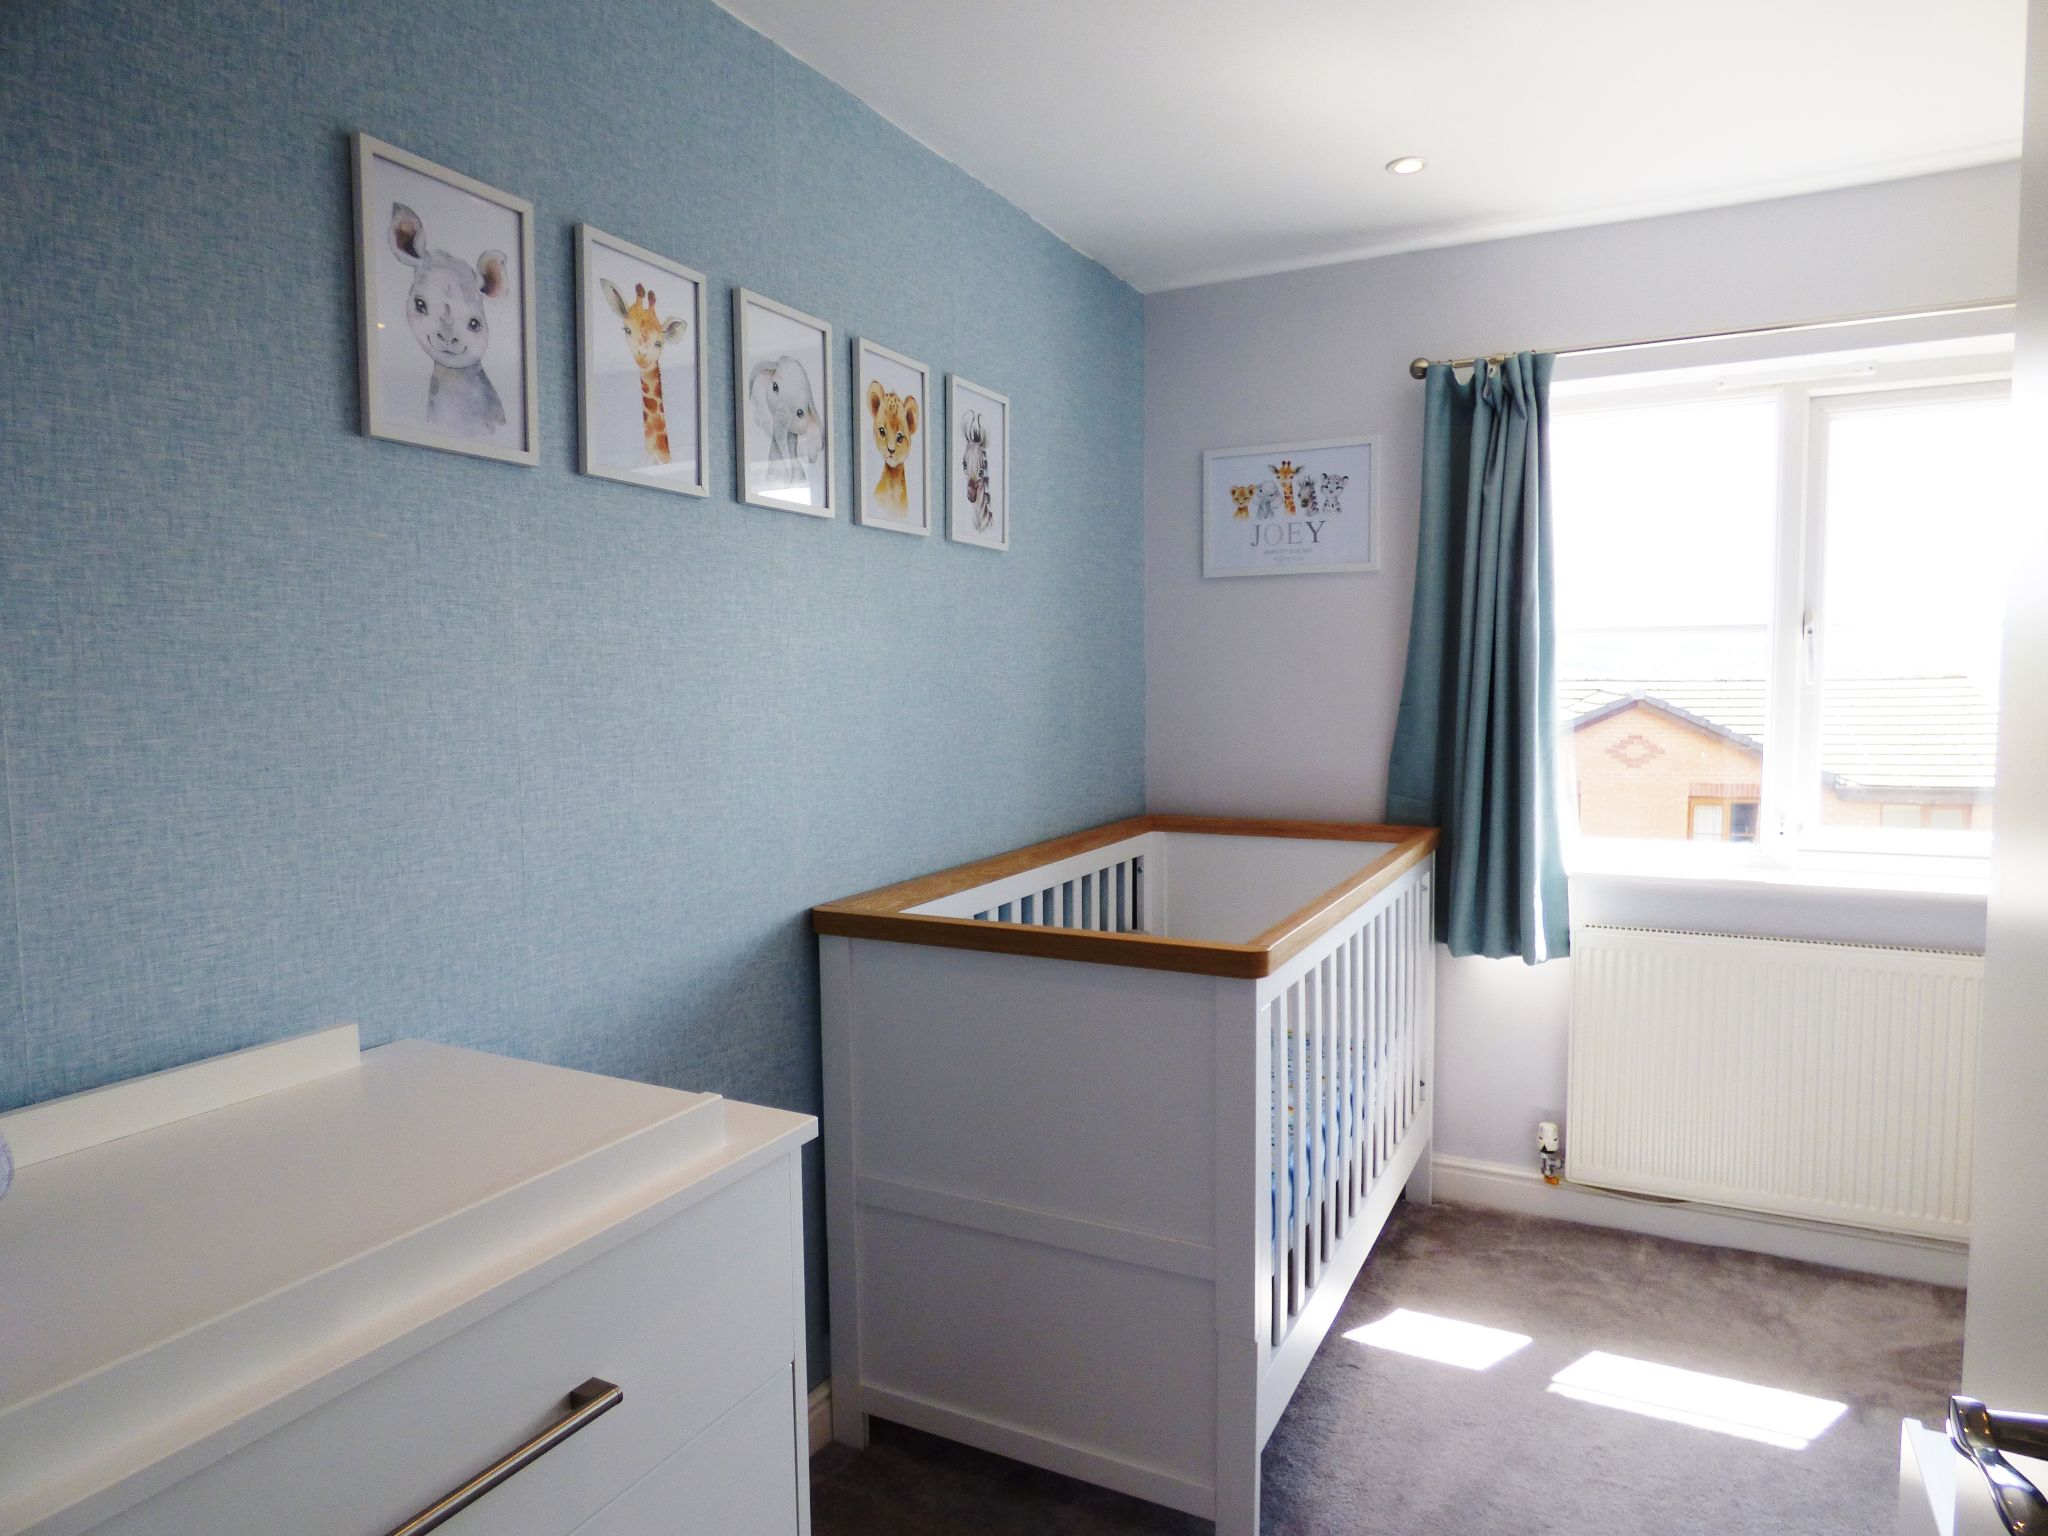 4 Bedroom Semi-detached House For Sale - Bedroom Three